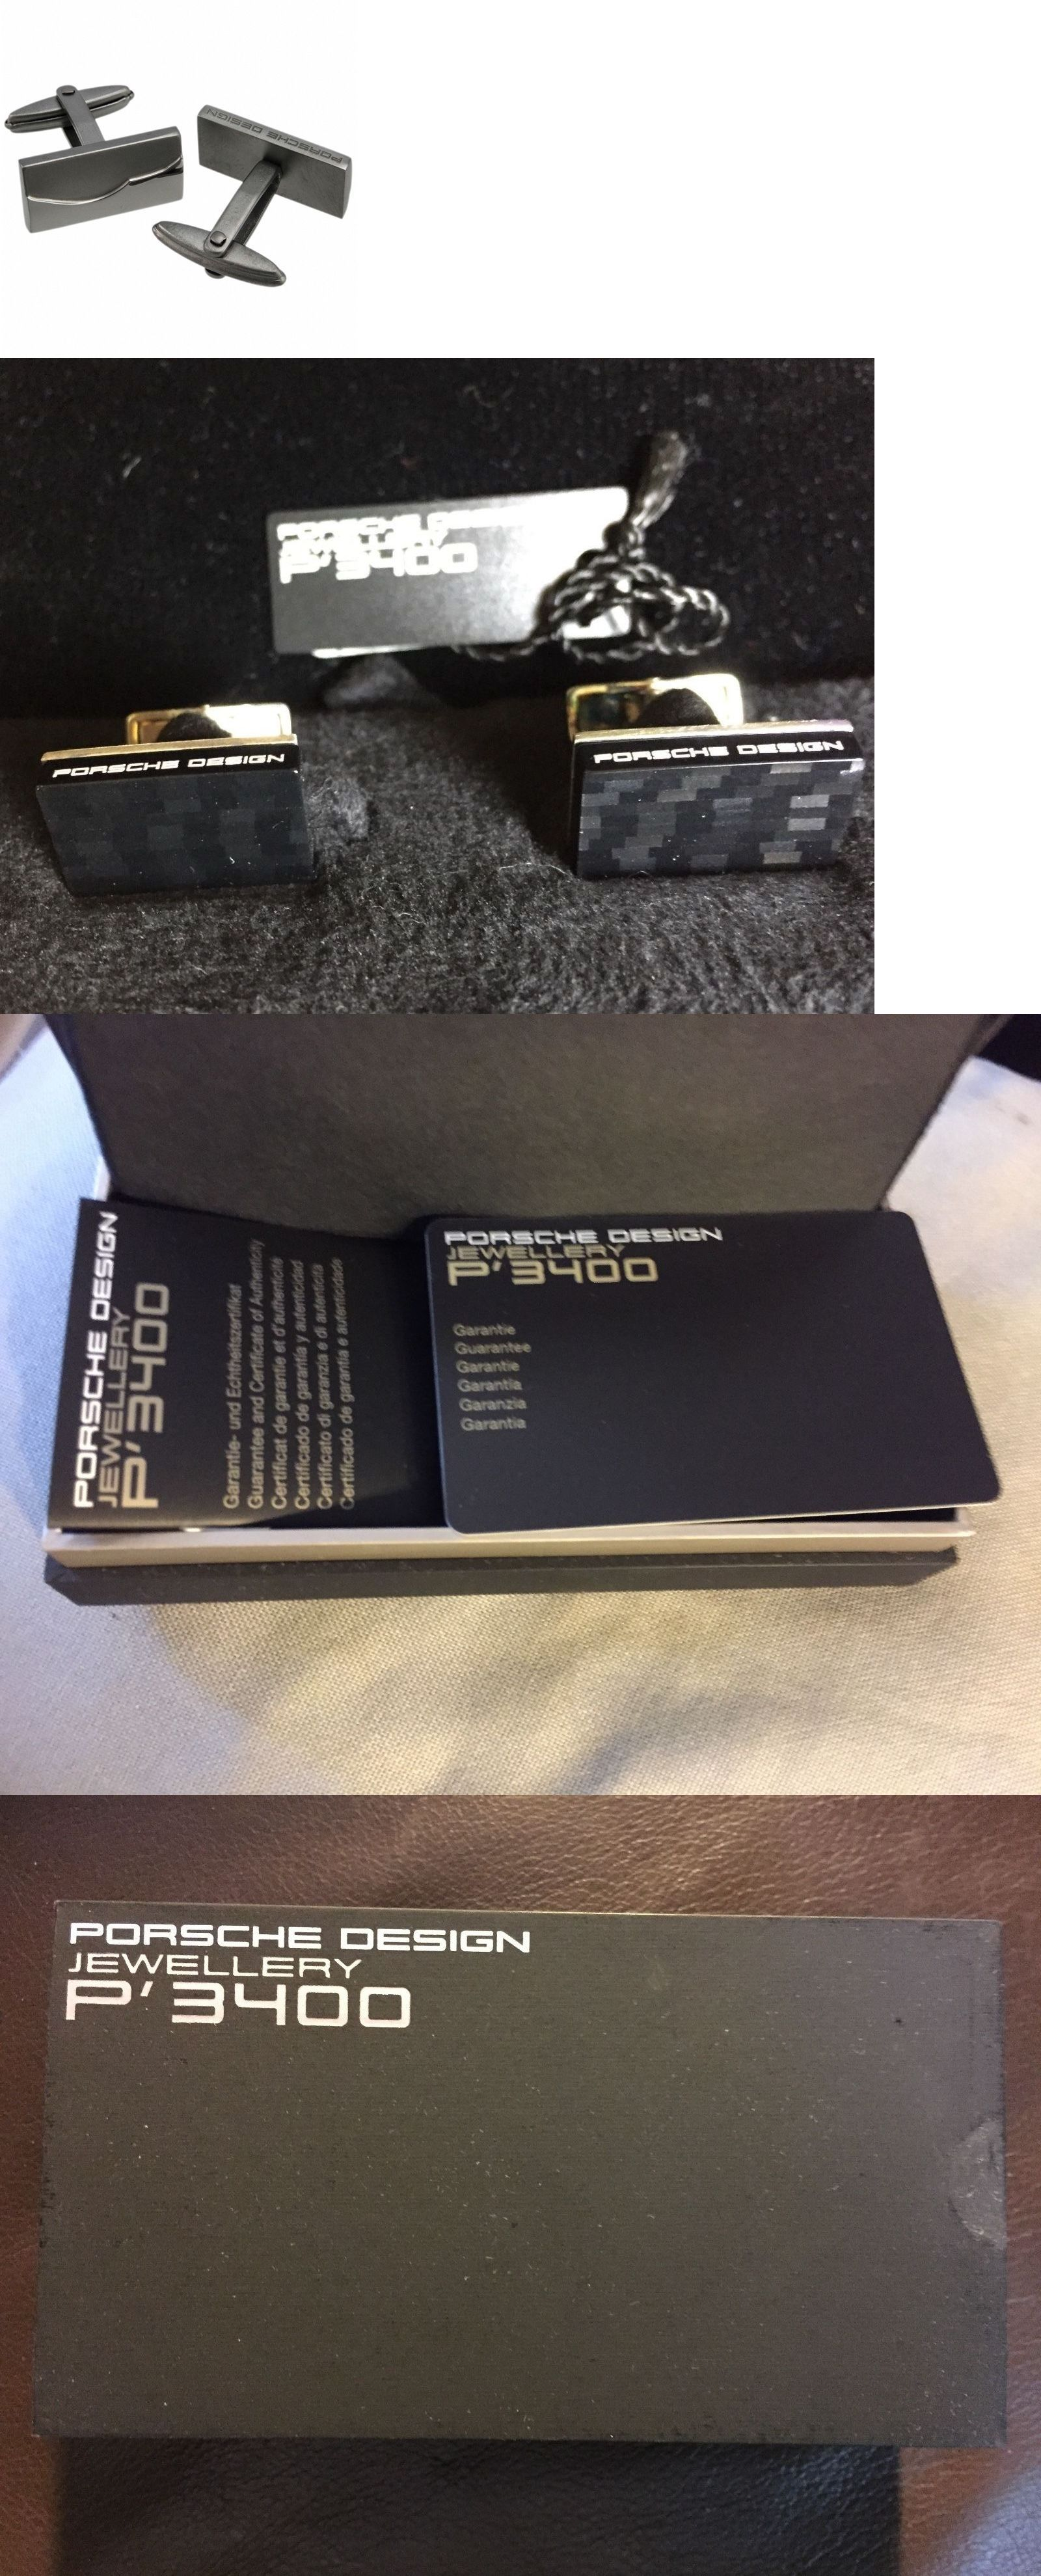 Cufflinks 137843: Porsche Design Black Acetate, Sterling Silver Cufflinks Nib W Brochure Etc 1525 -> BUY IT NOW ONLY: $255 on eBay!